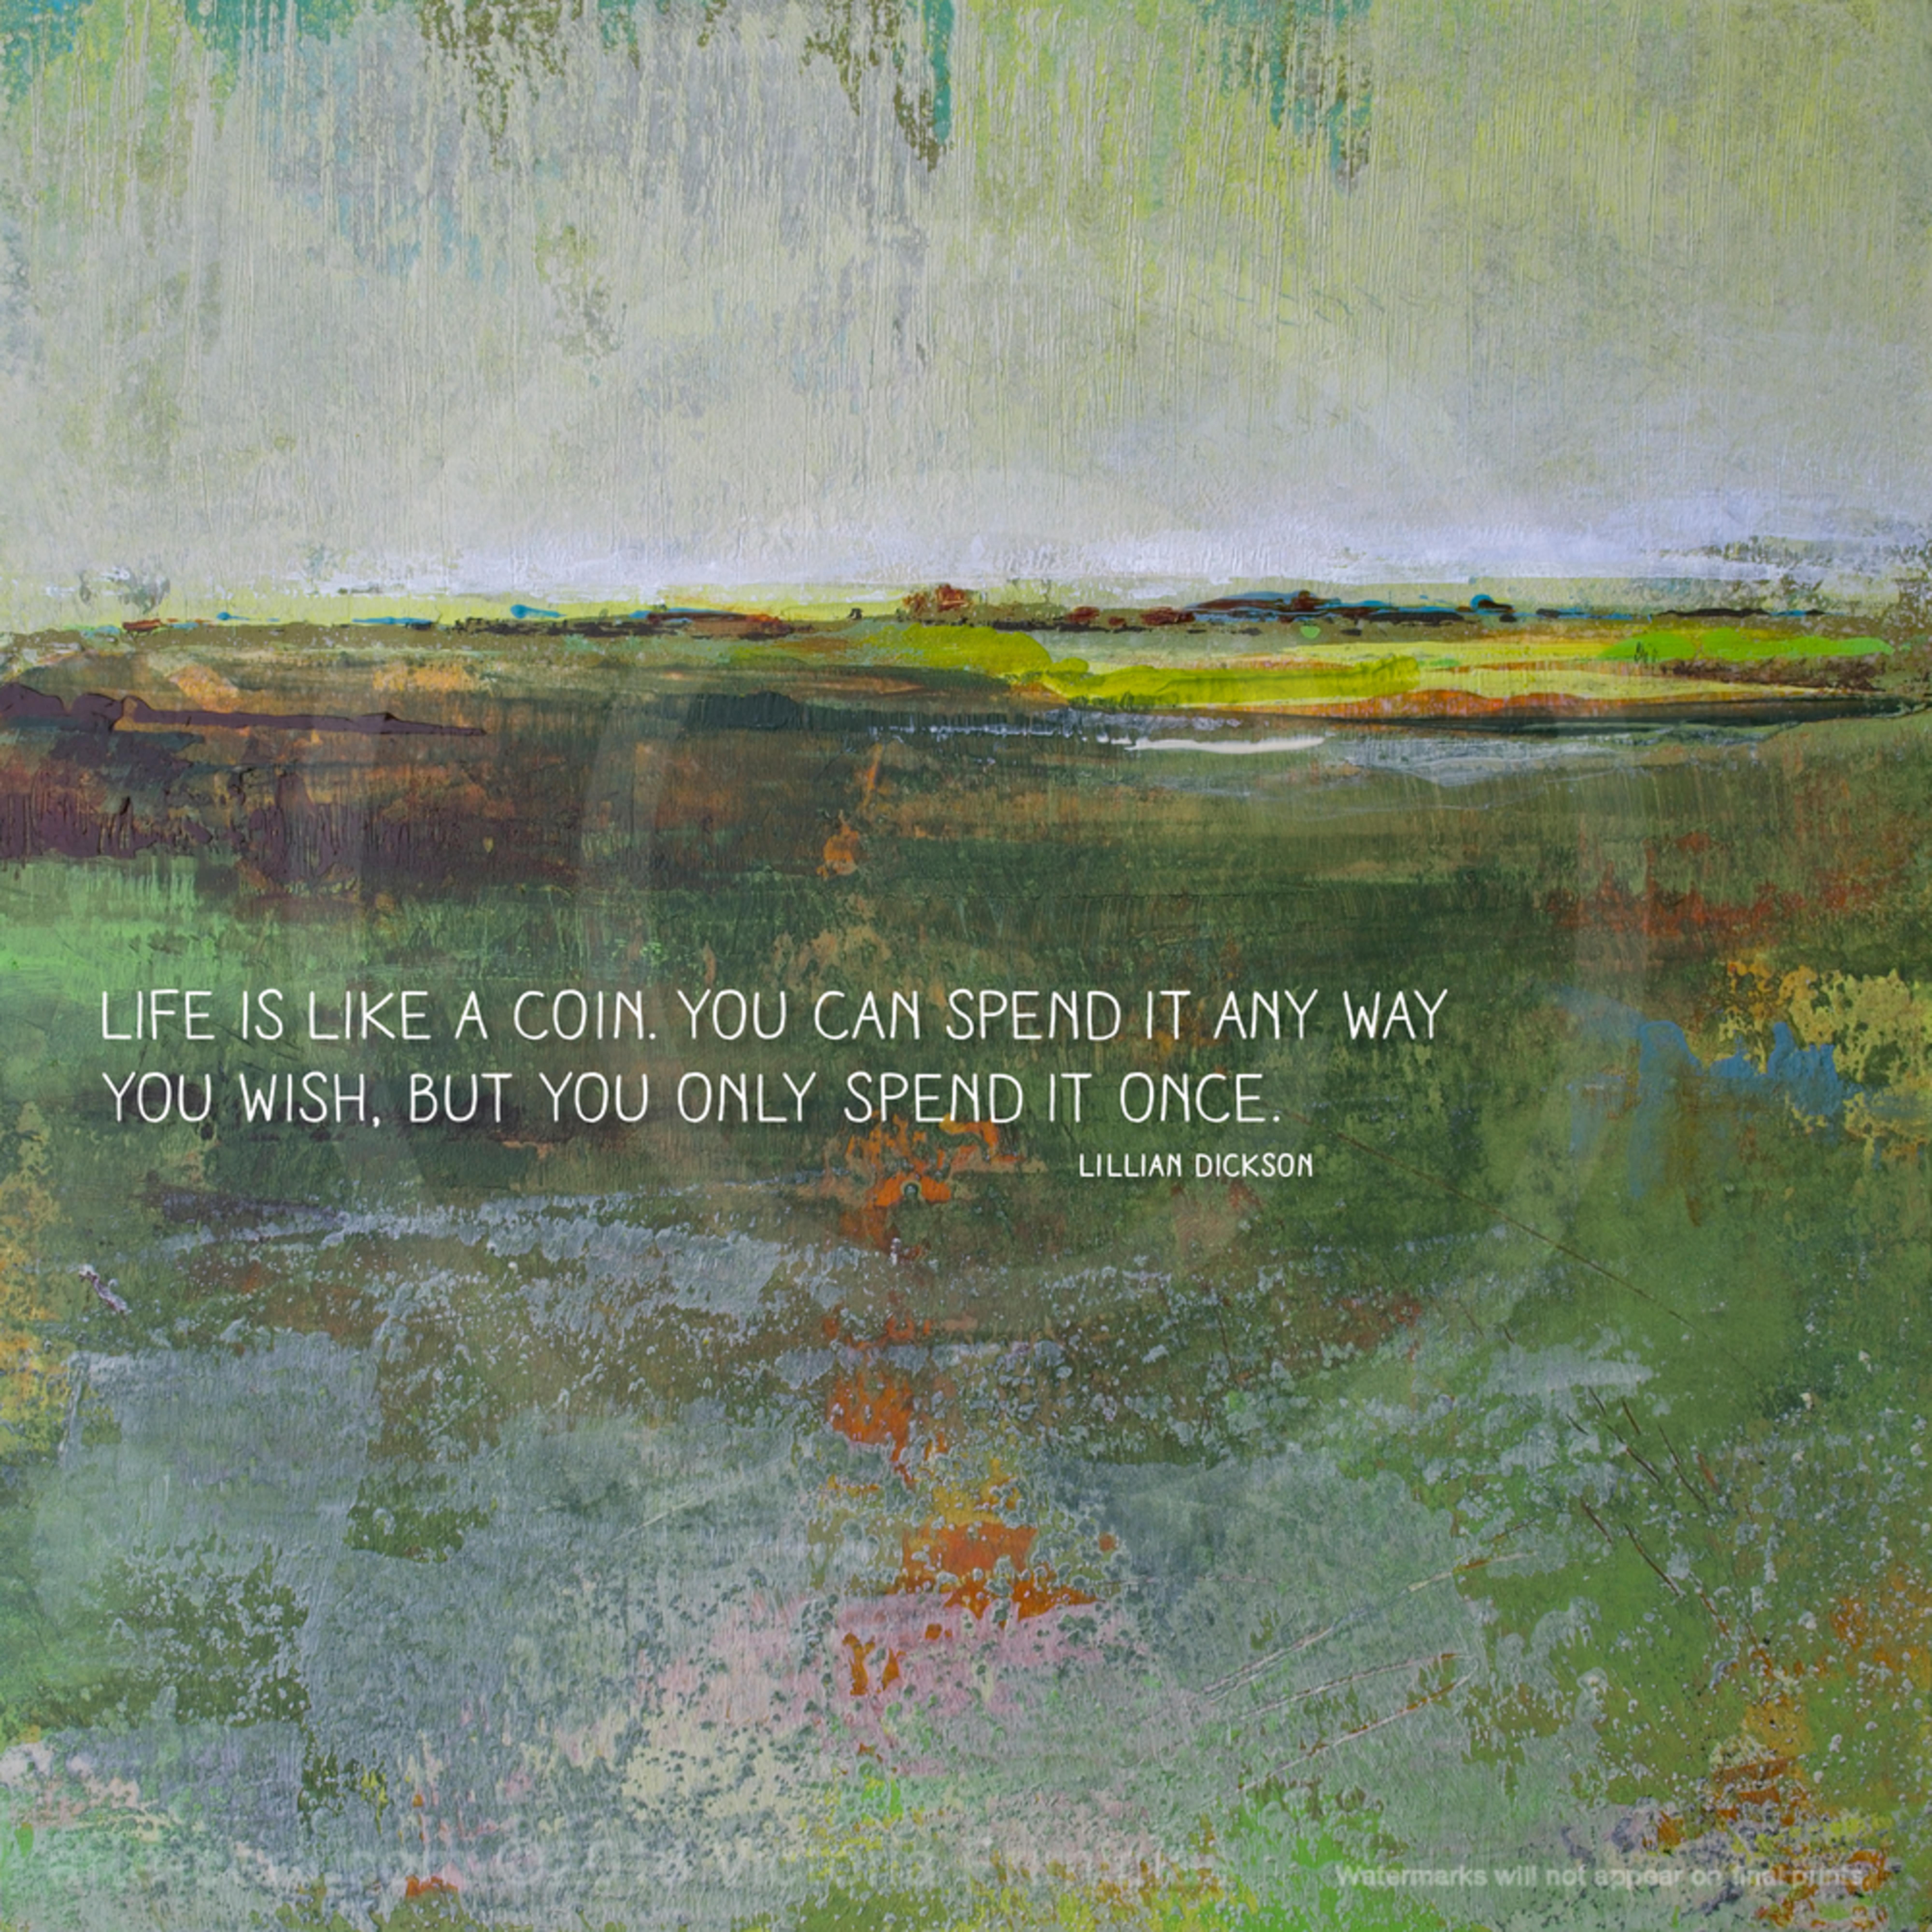 Life is quotes verdant excuse dickson nvhhpj